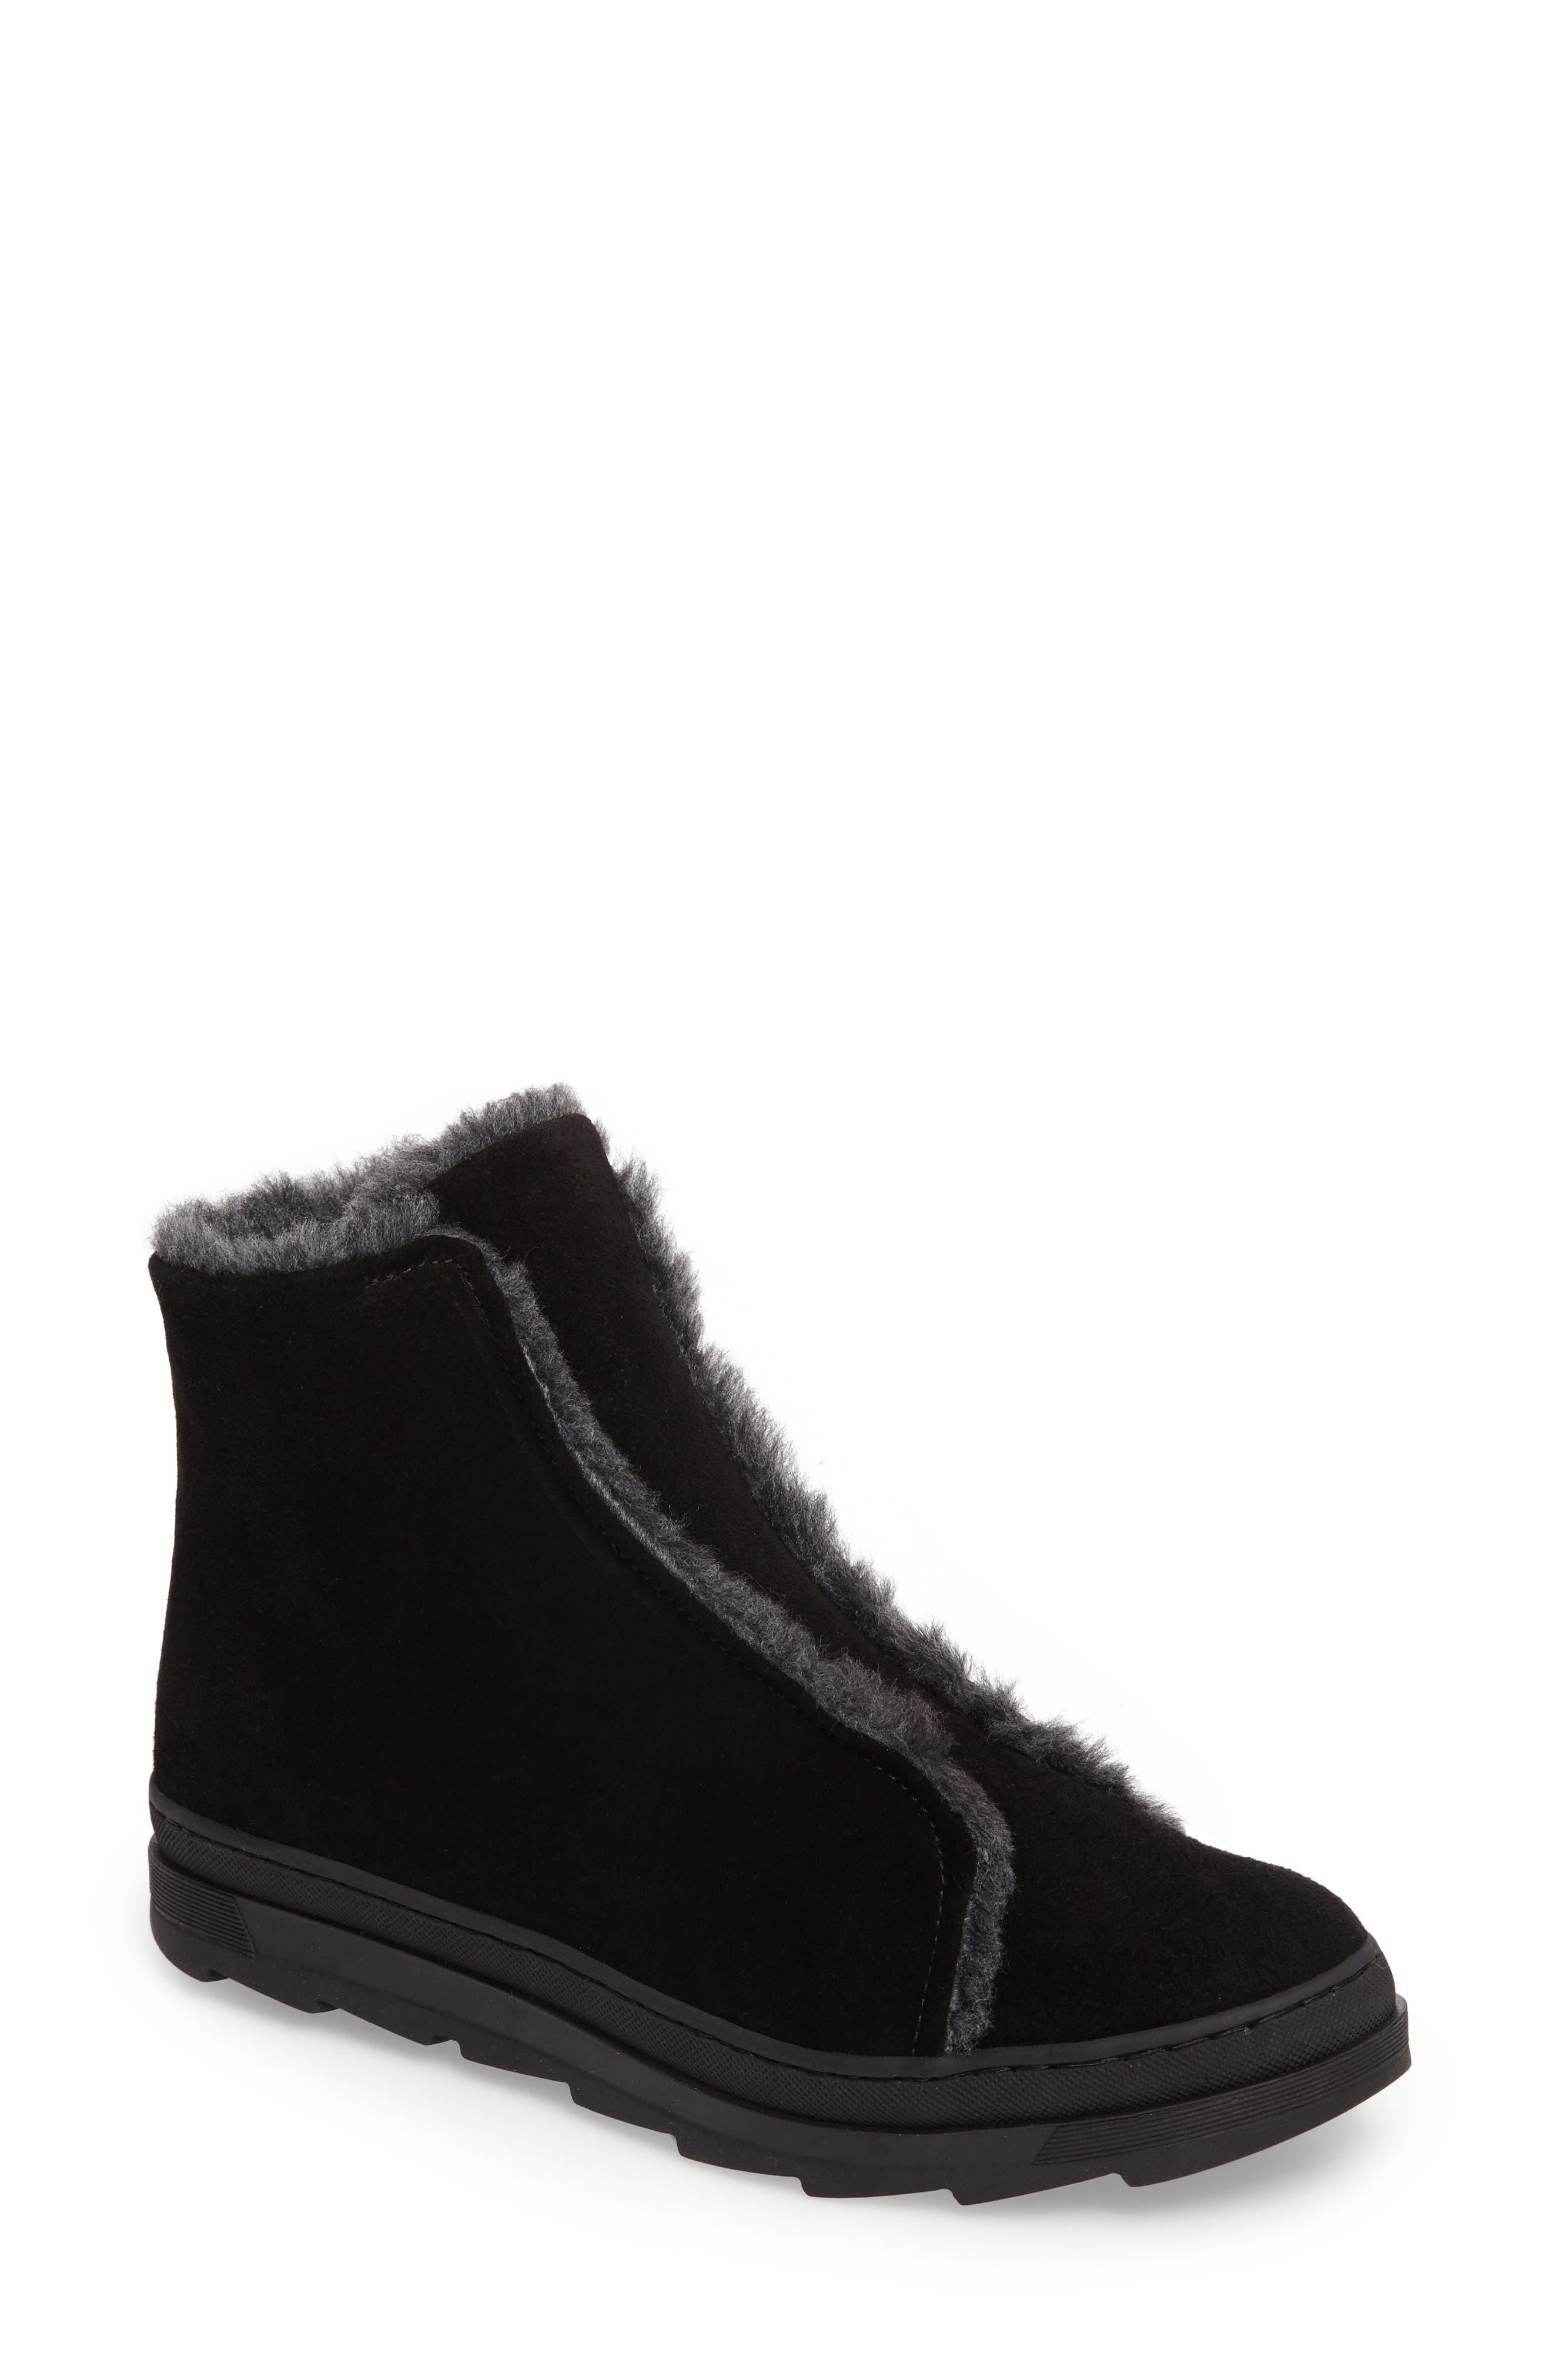 Virina Boot,                             Main thumbnail 1, color,                             Black Suede